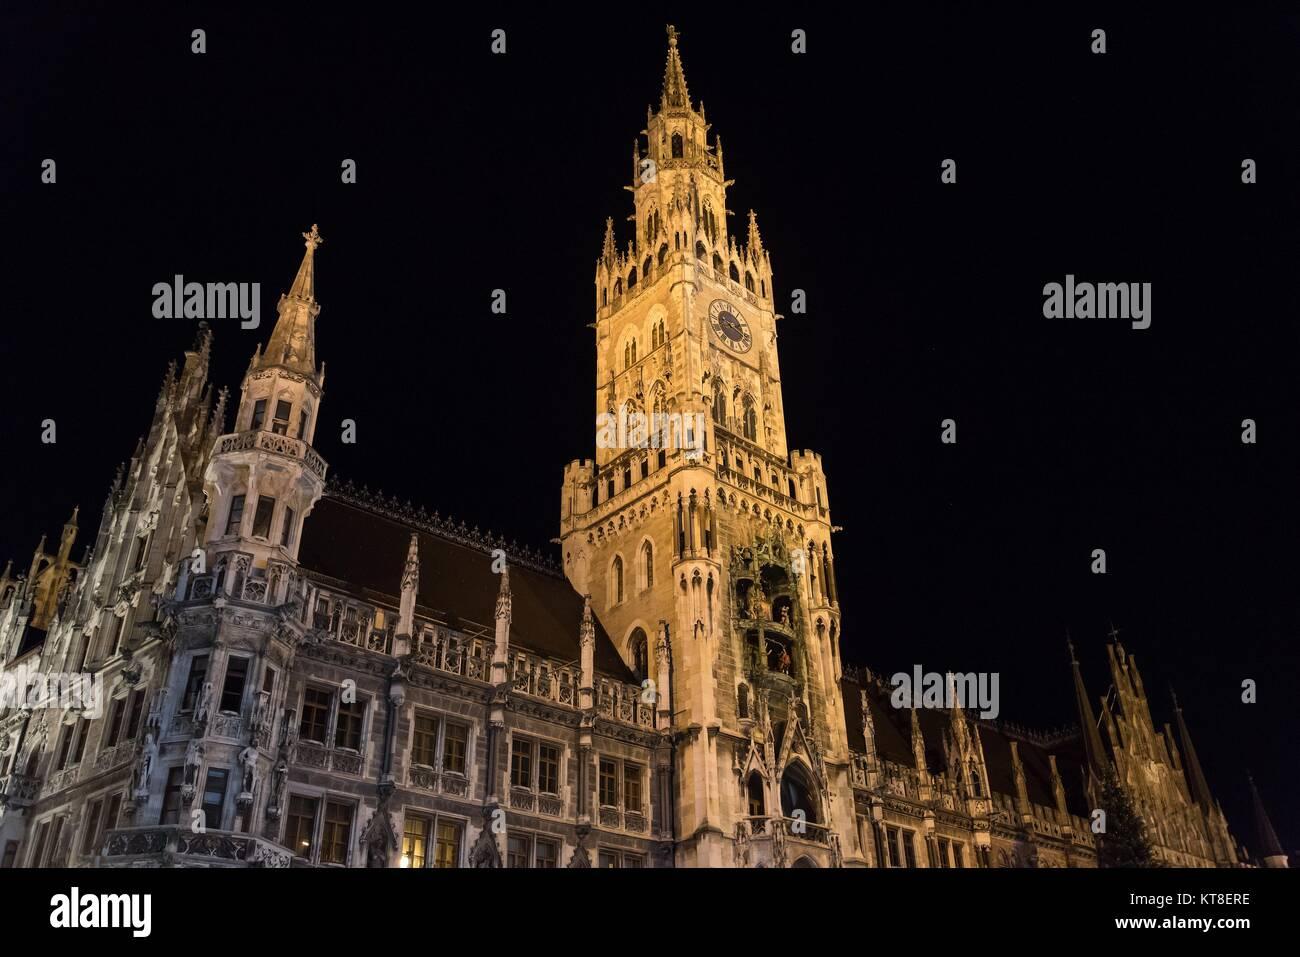 Night scene of town hall at the Marienplatz in Munich, Germany. Horizontal image. - Stock Image